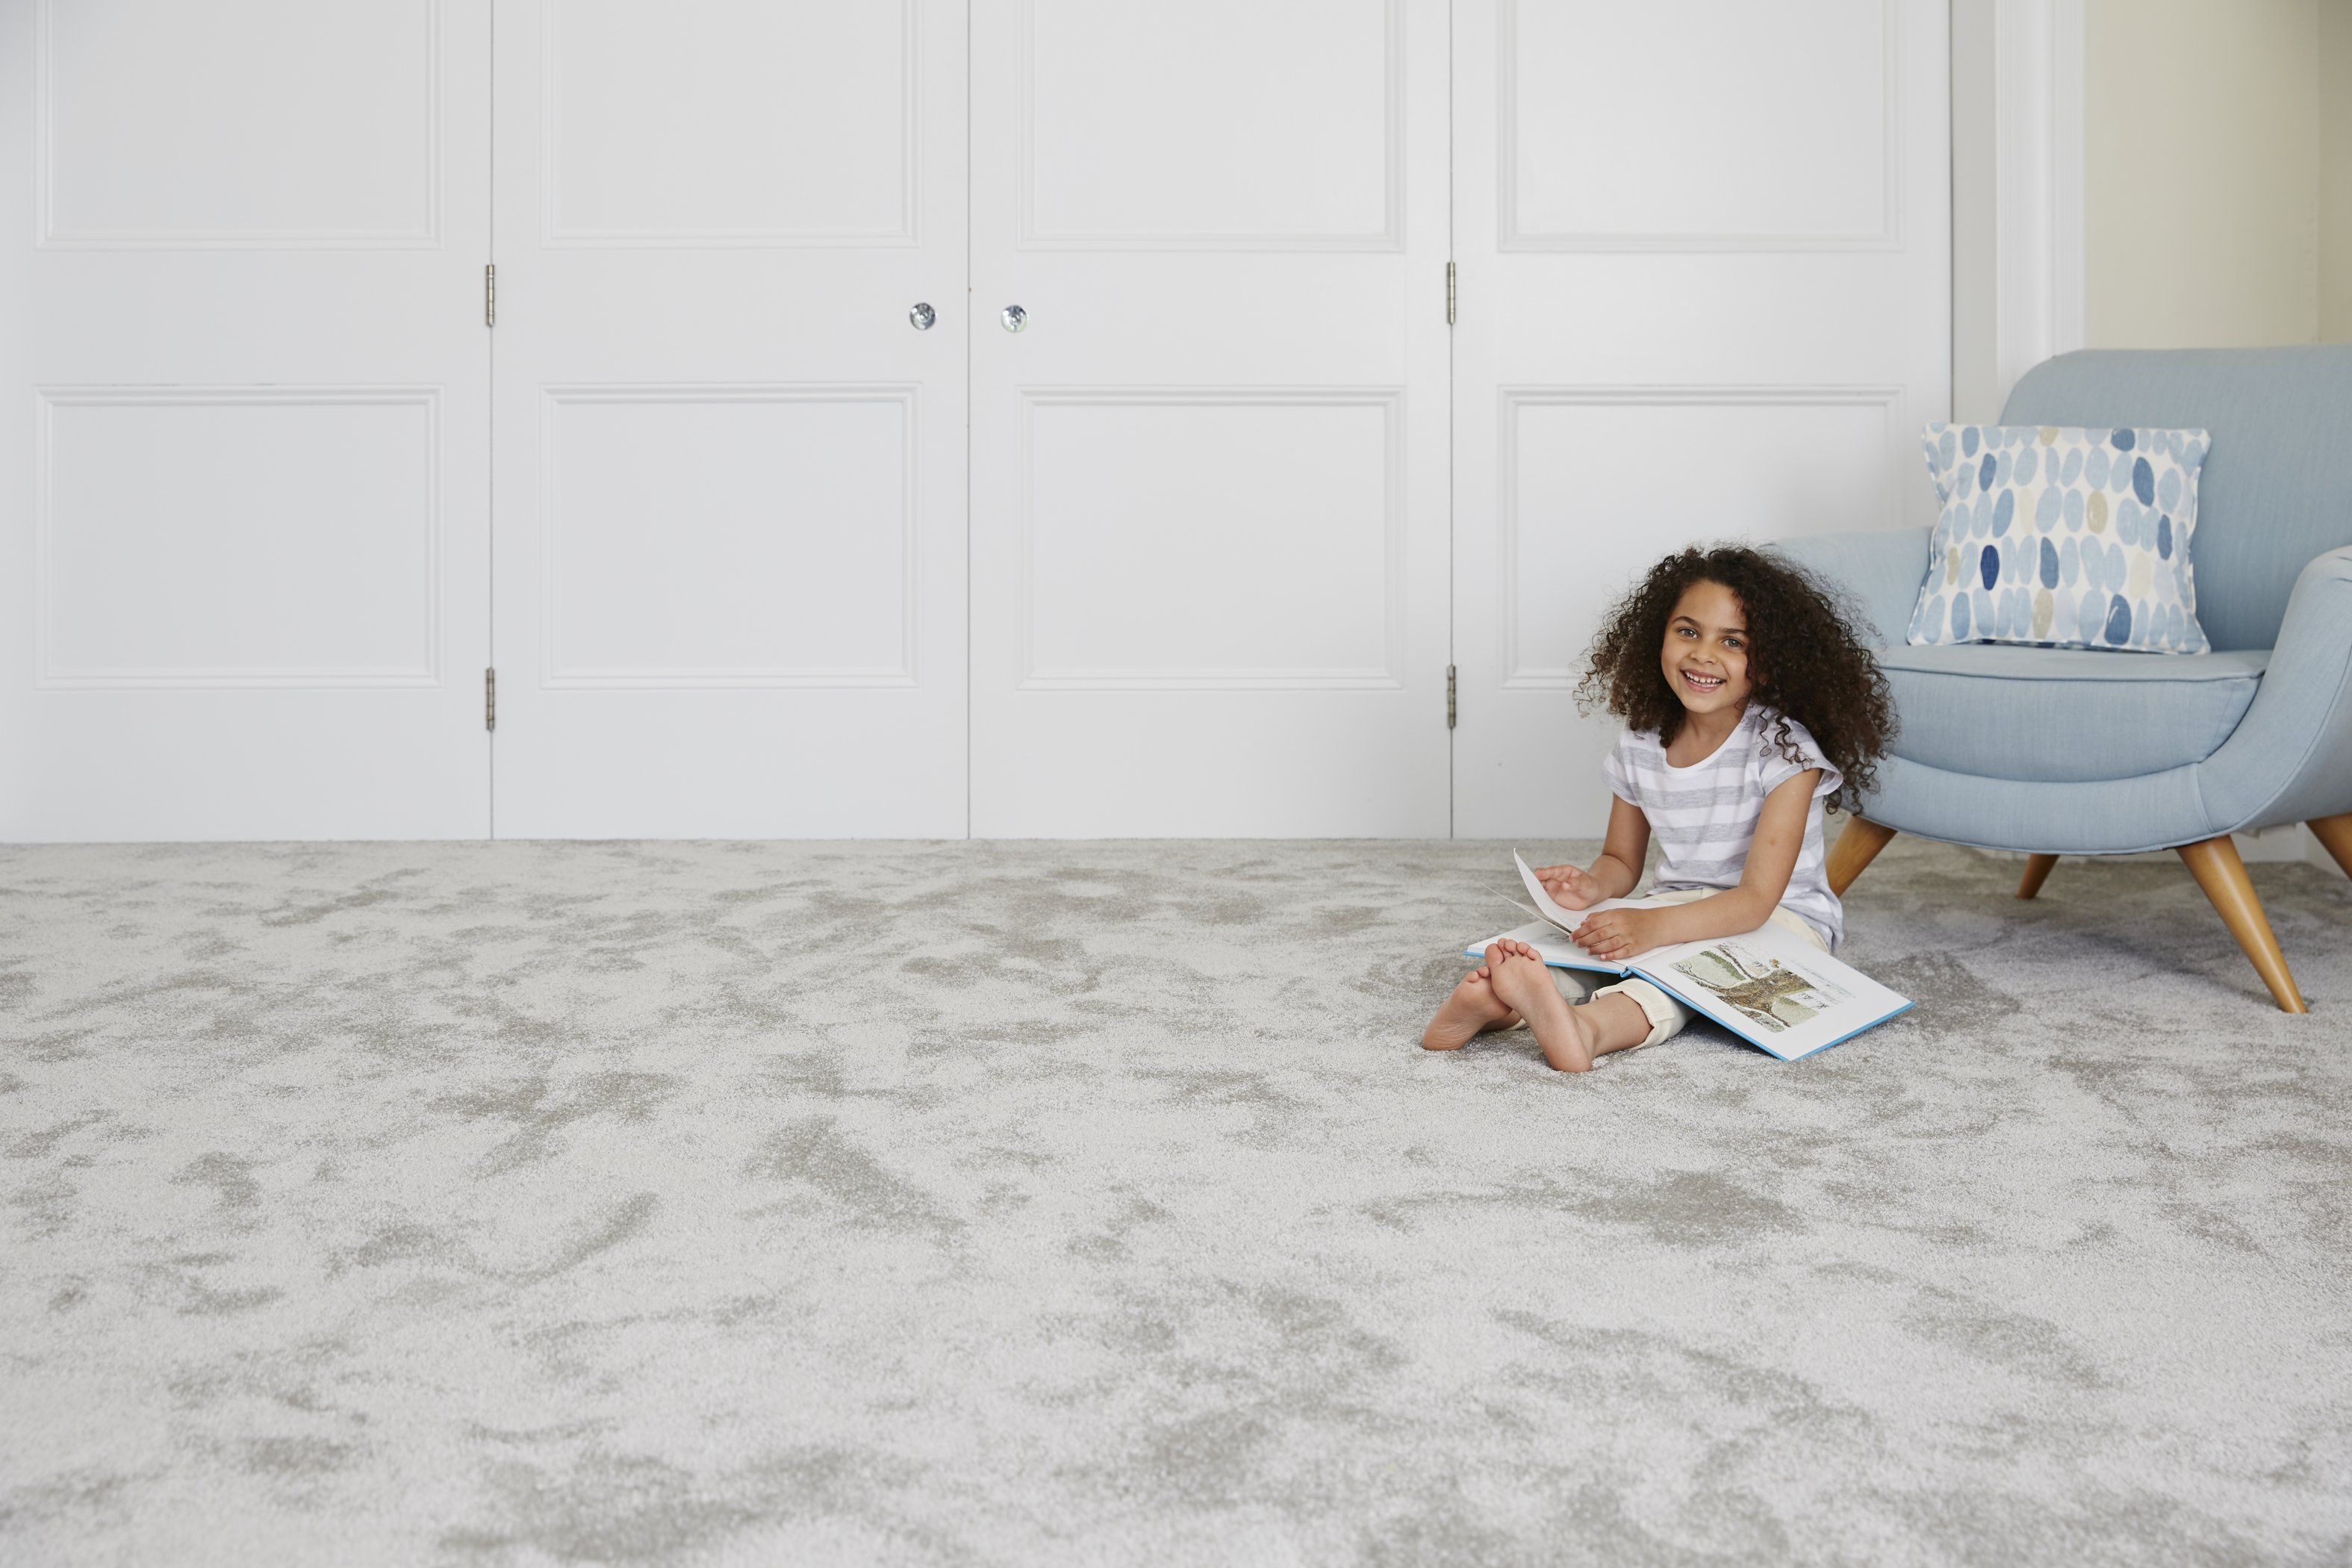 Soft Focus Playroom Flooring How To Clean Carpet Family Friendly Flooring